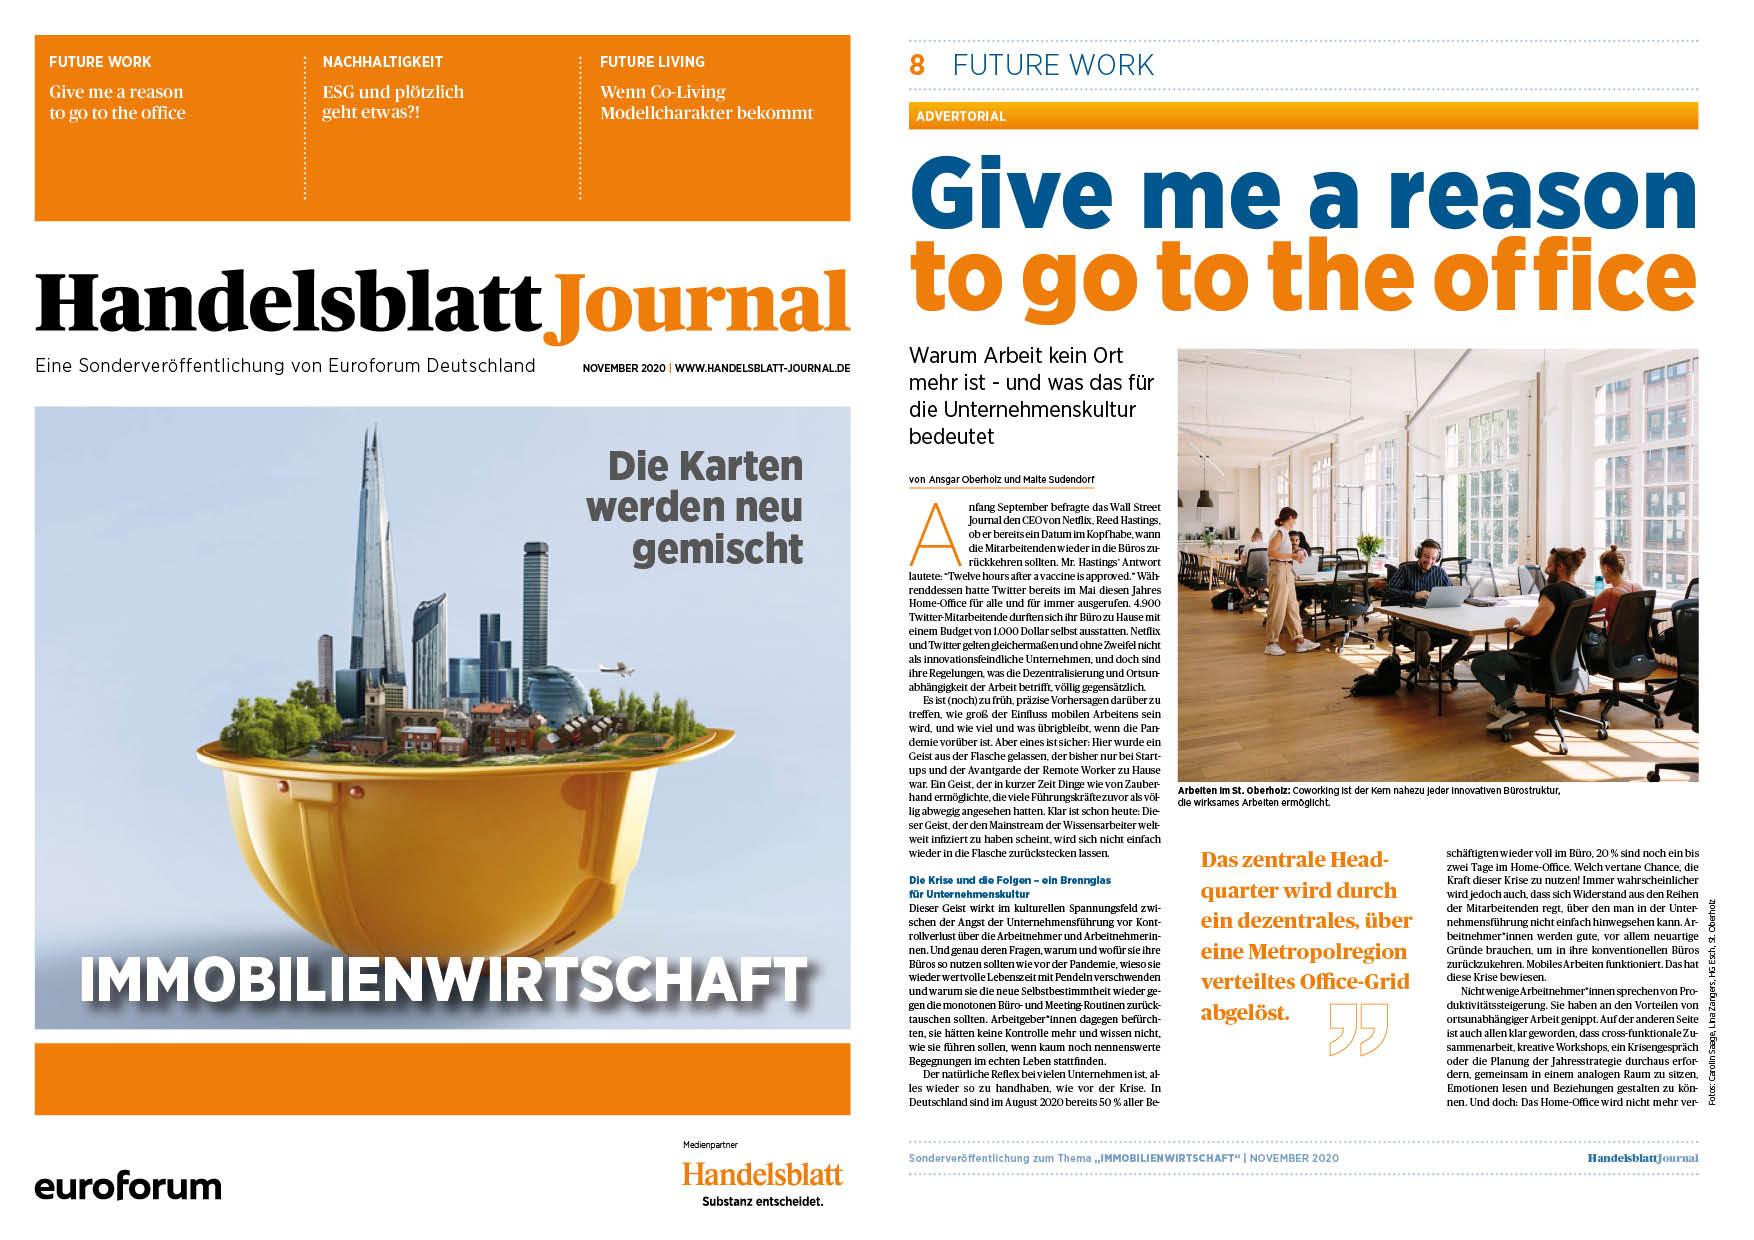 St. Oberholz im aktuellen Handelsblatt Journal